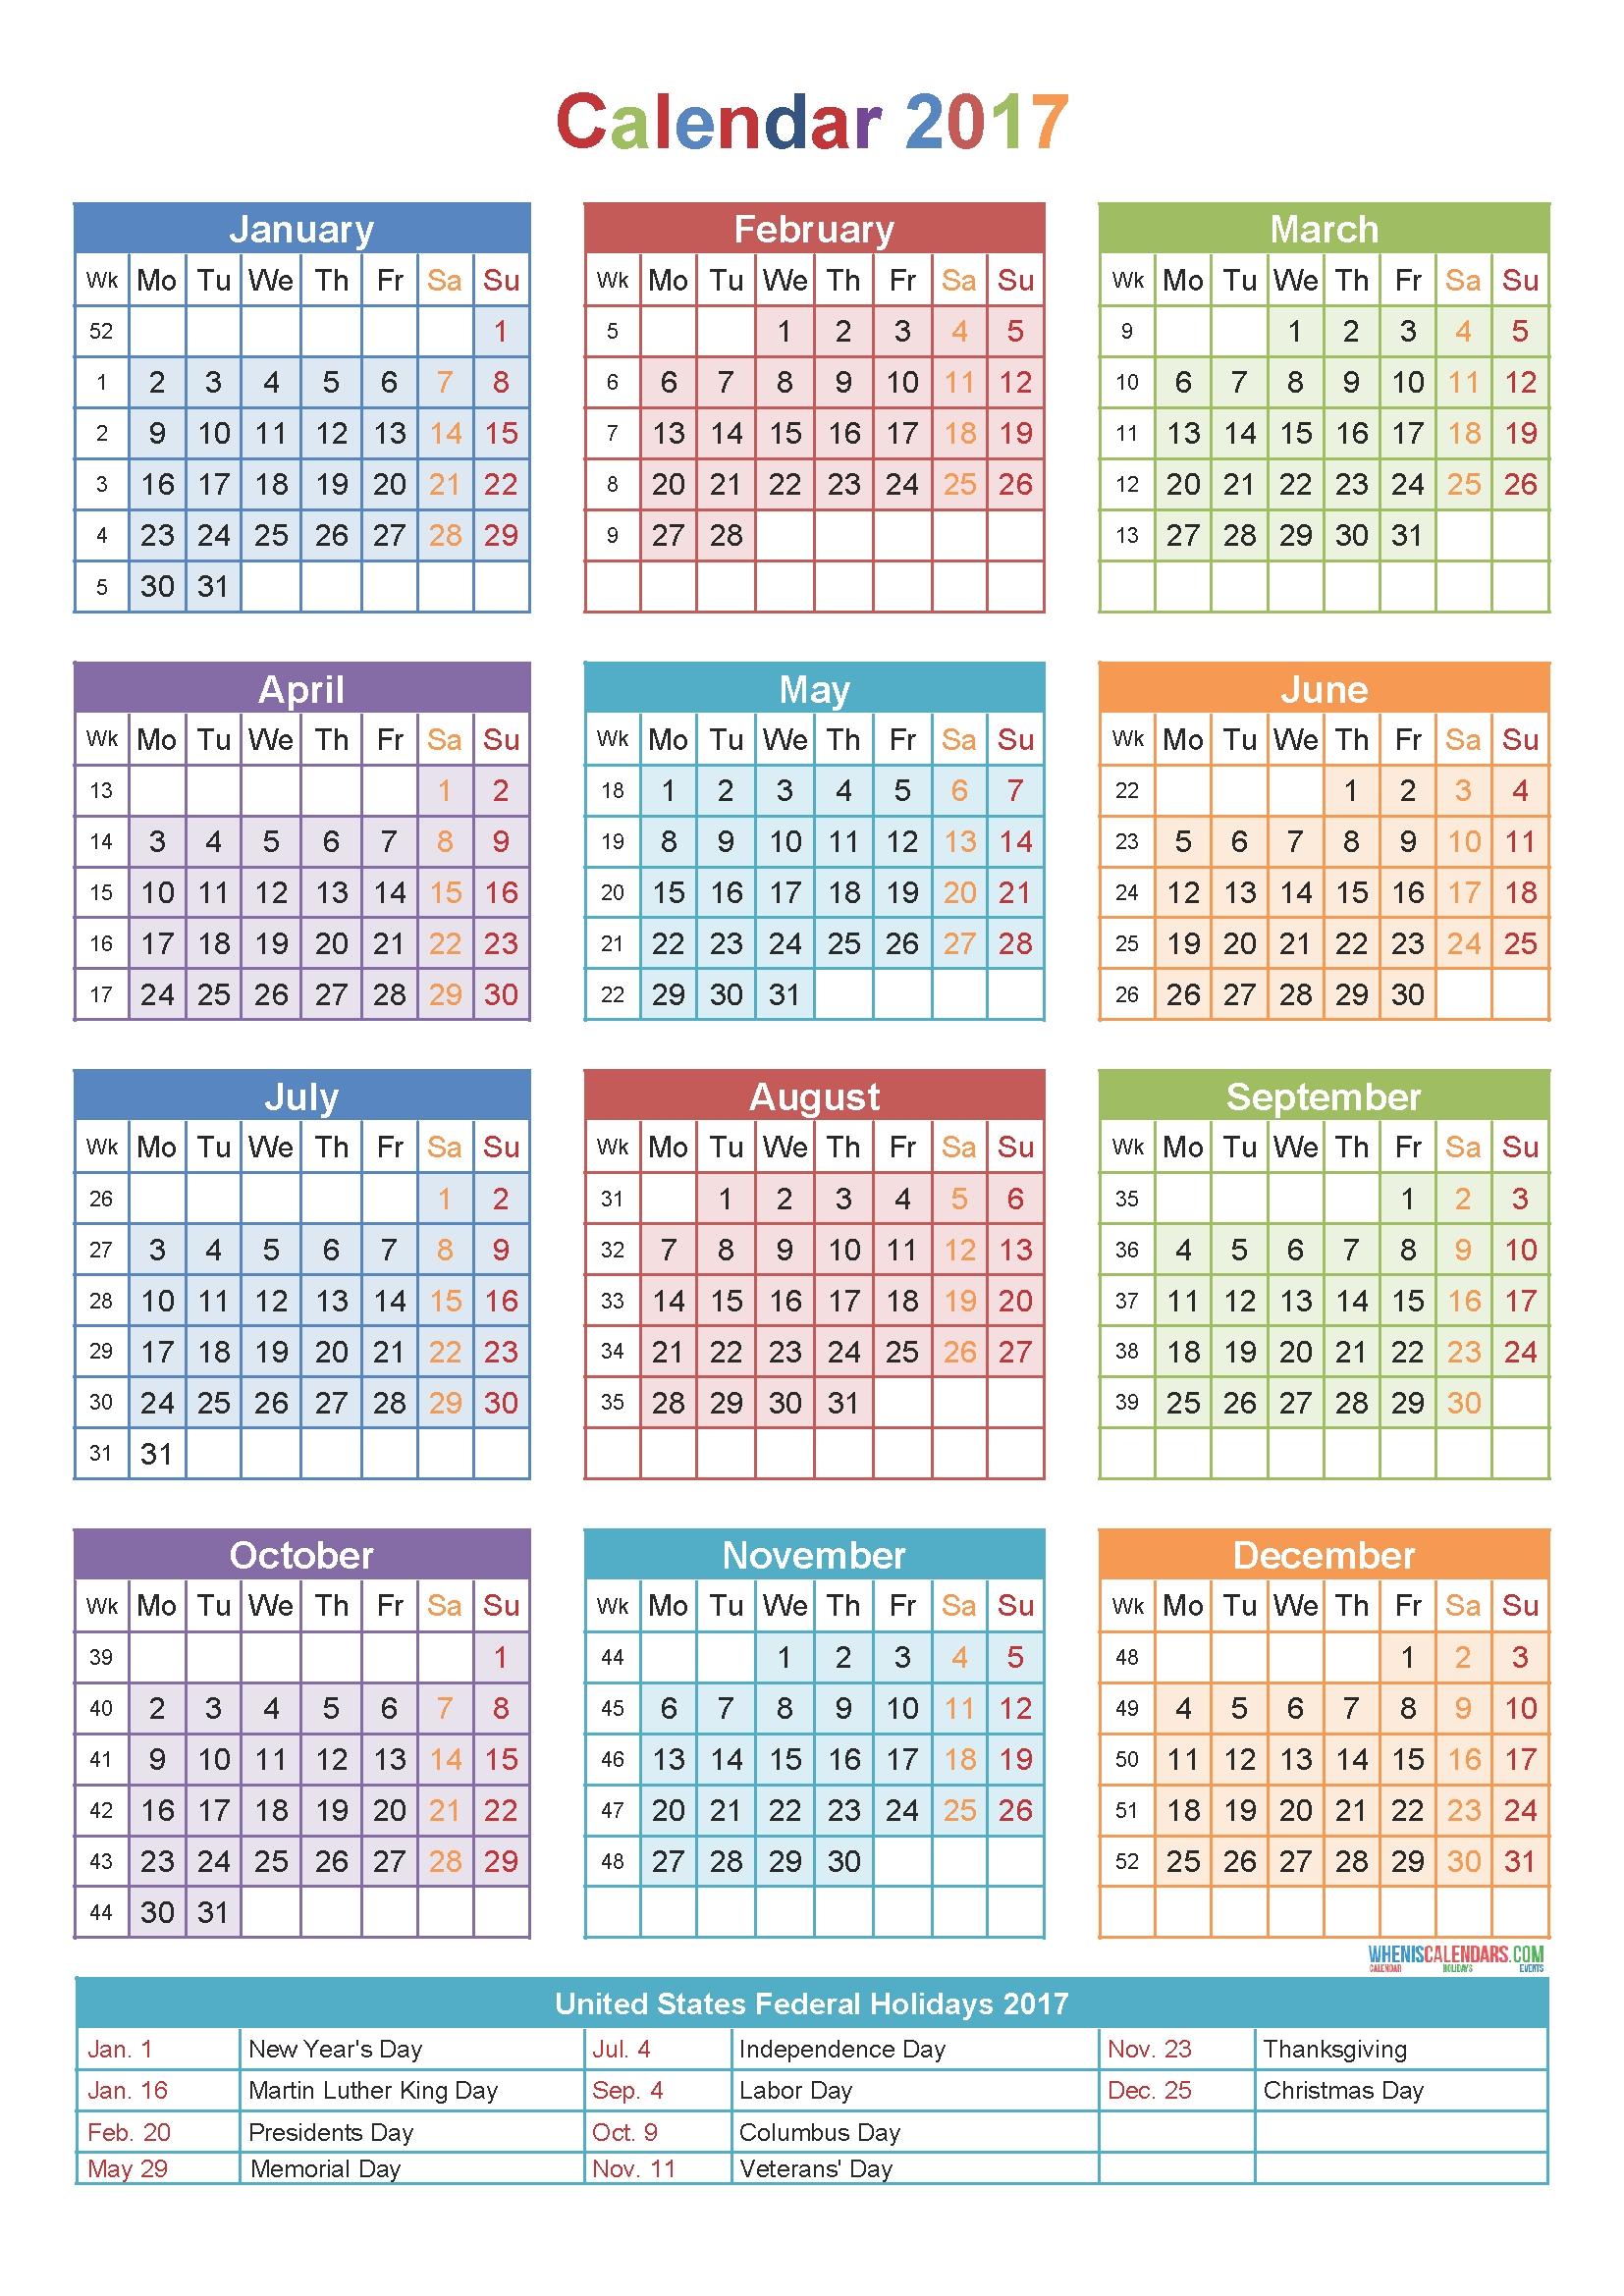 Calendar 2017 By Week Number   Yearly Calendar Template-Yearly Week Number Calendar Excel0.